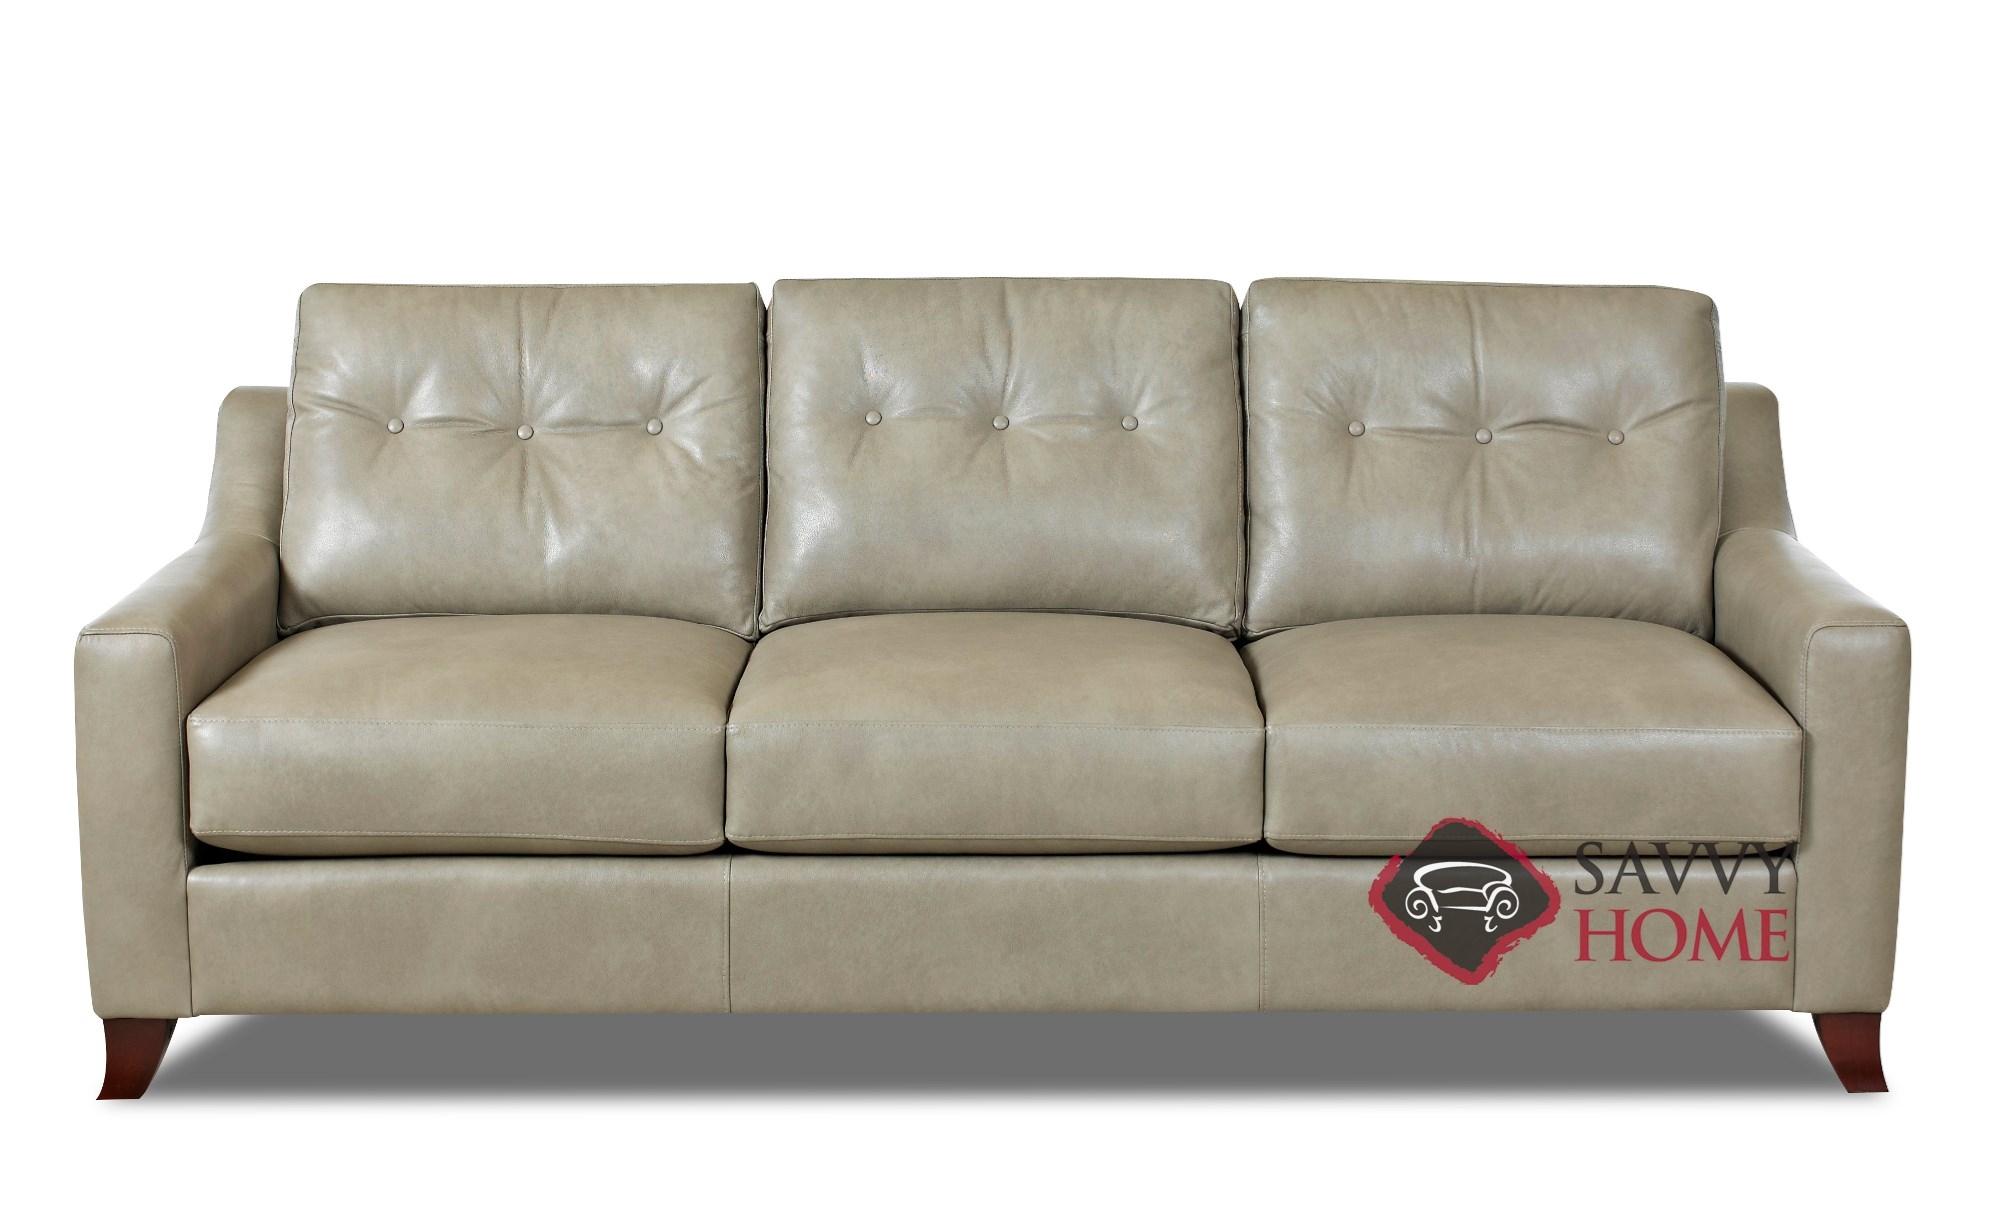 sofa austin tx u laeder brugt leather sofas s furniture depot thesofa